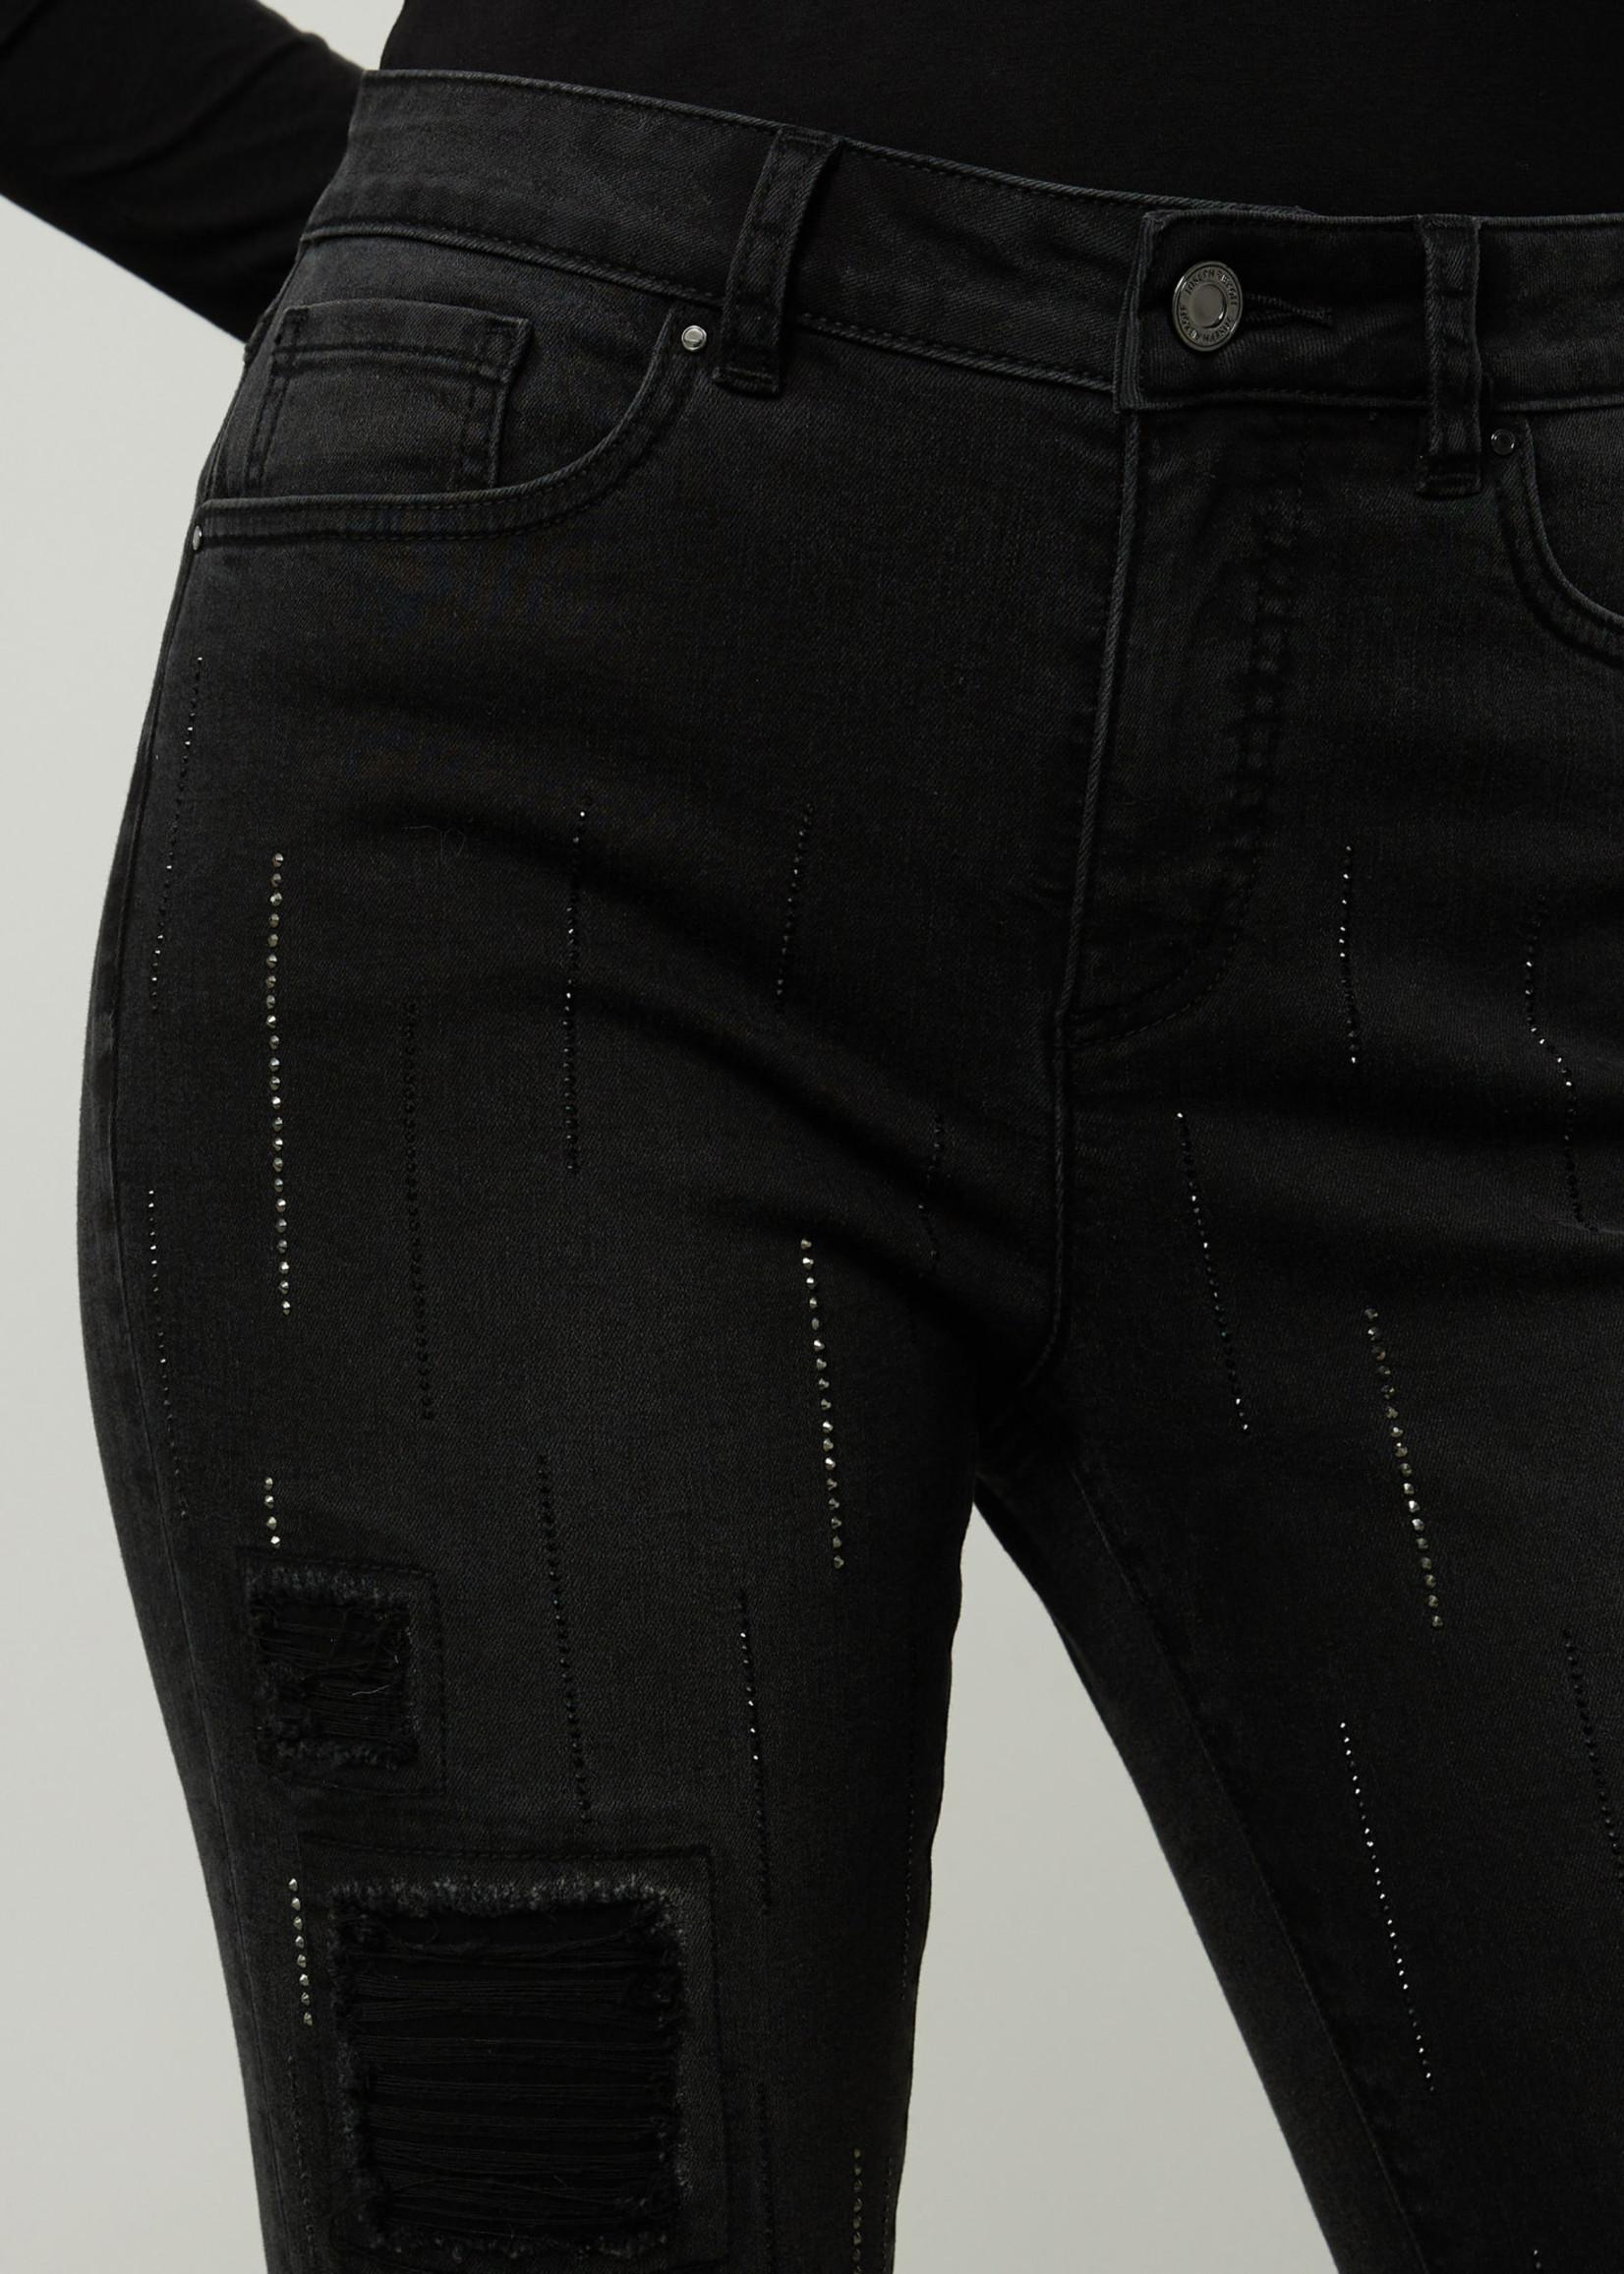 Joseph Ribkoff Joseph Ribkoff Embellished Jeans Style